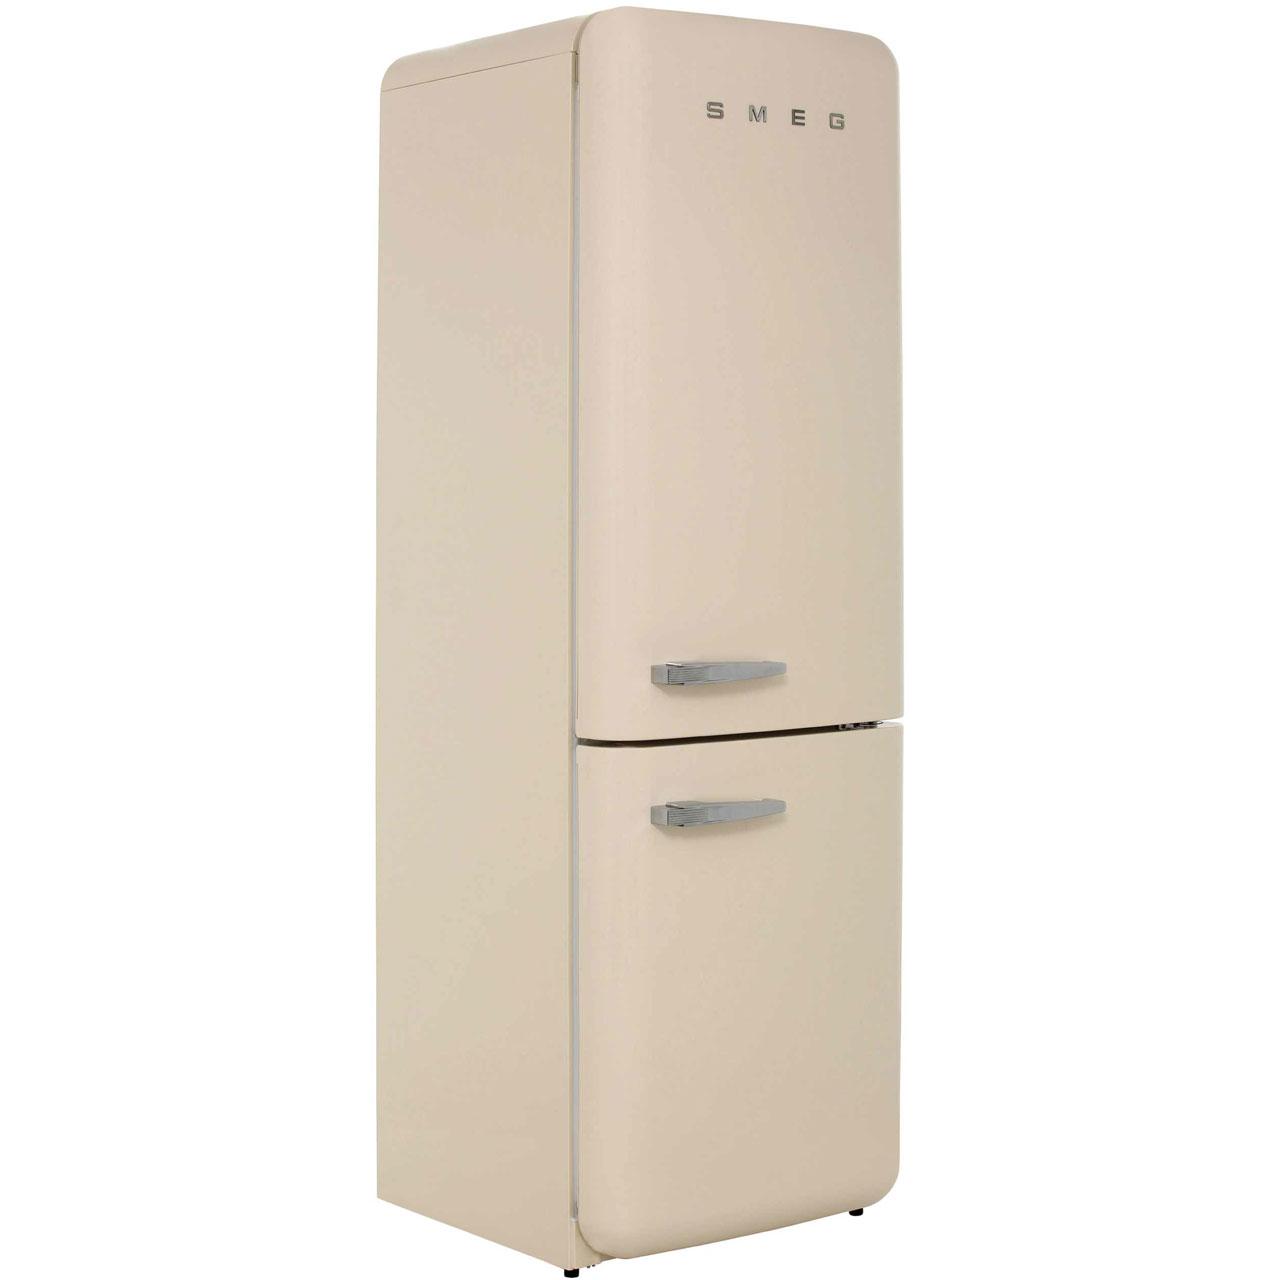 Smeg Right Hand Hinge FAB32RNC Free Standing Fridge Freezer Frost Free in Cream